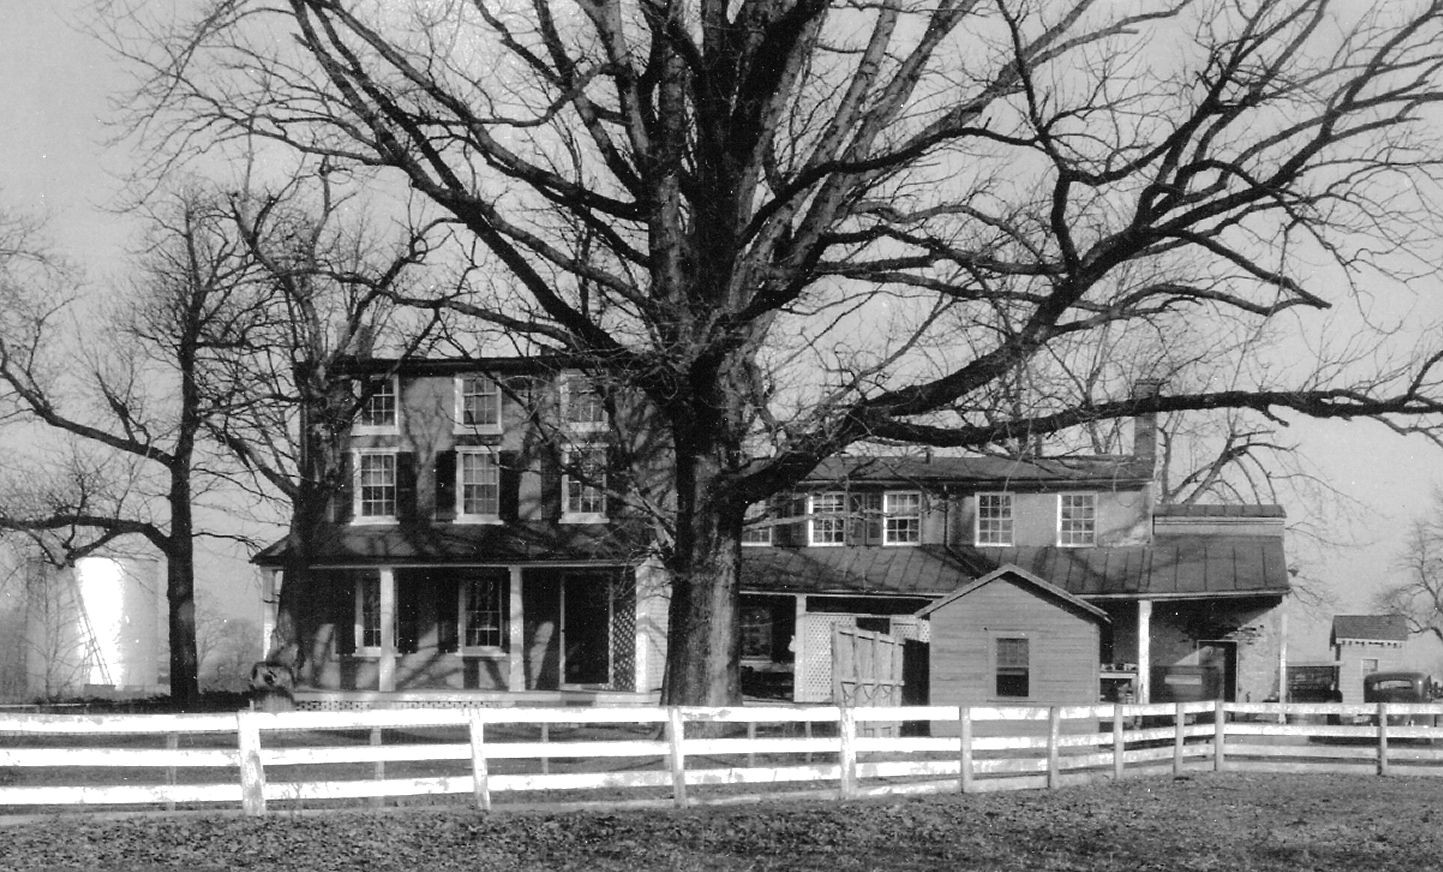 Hollingsworth House circa 1920